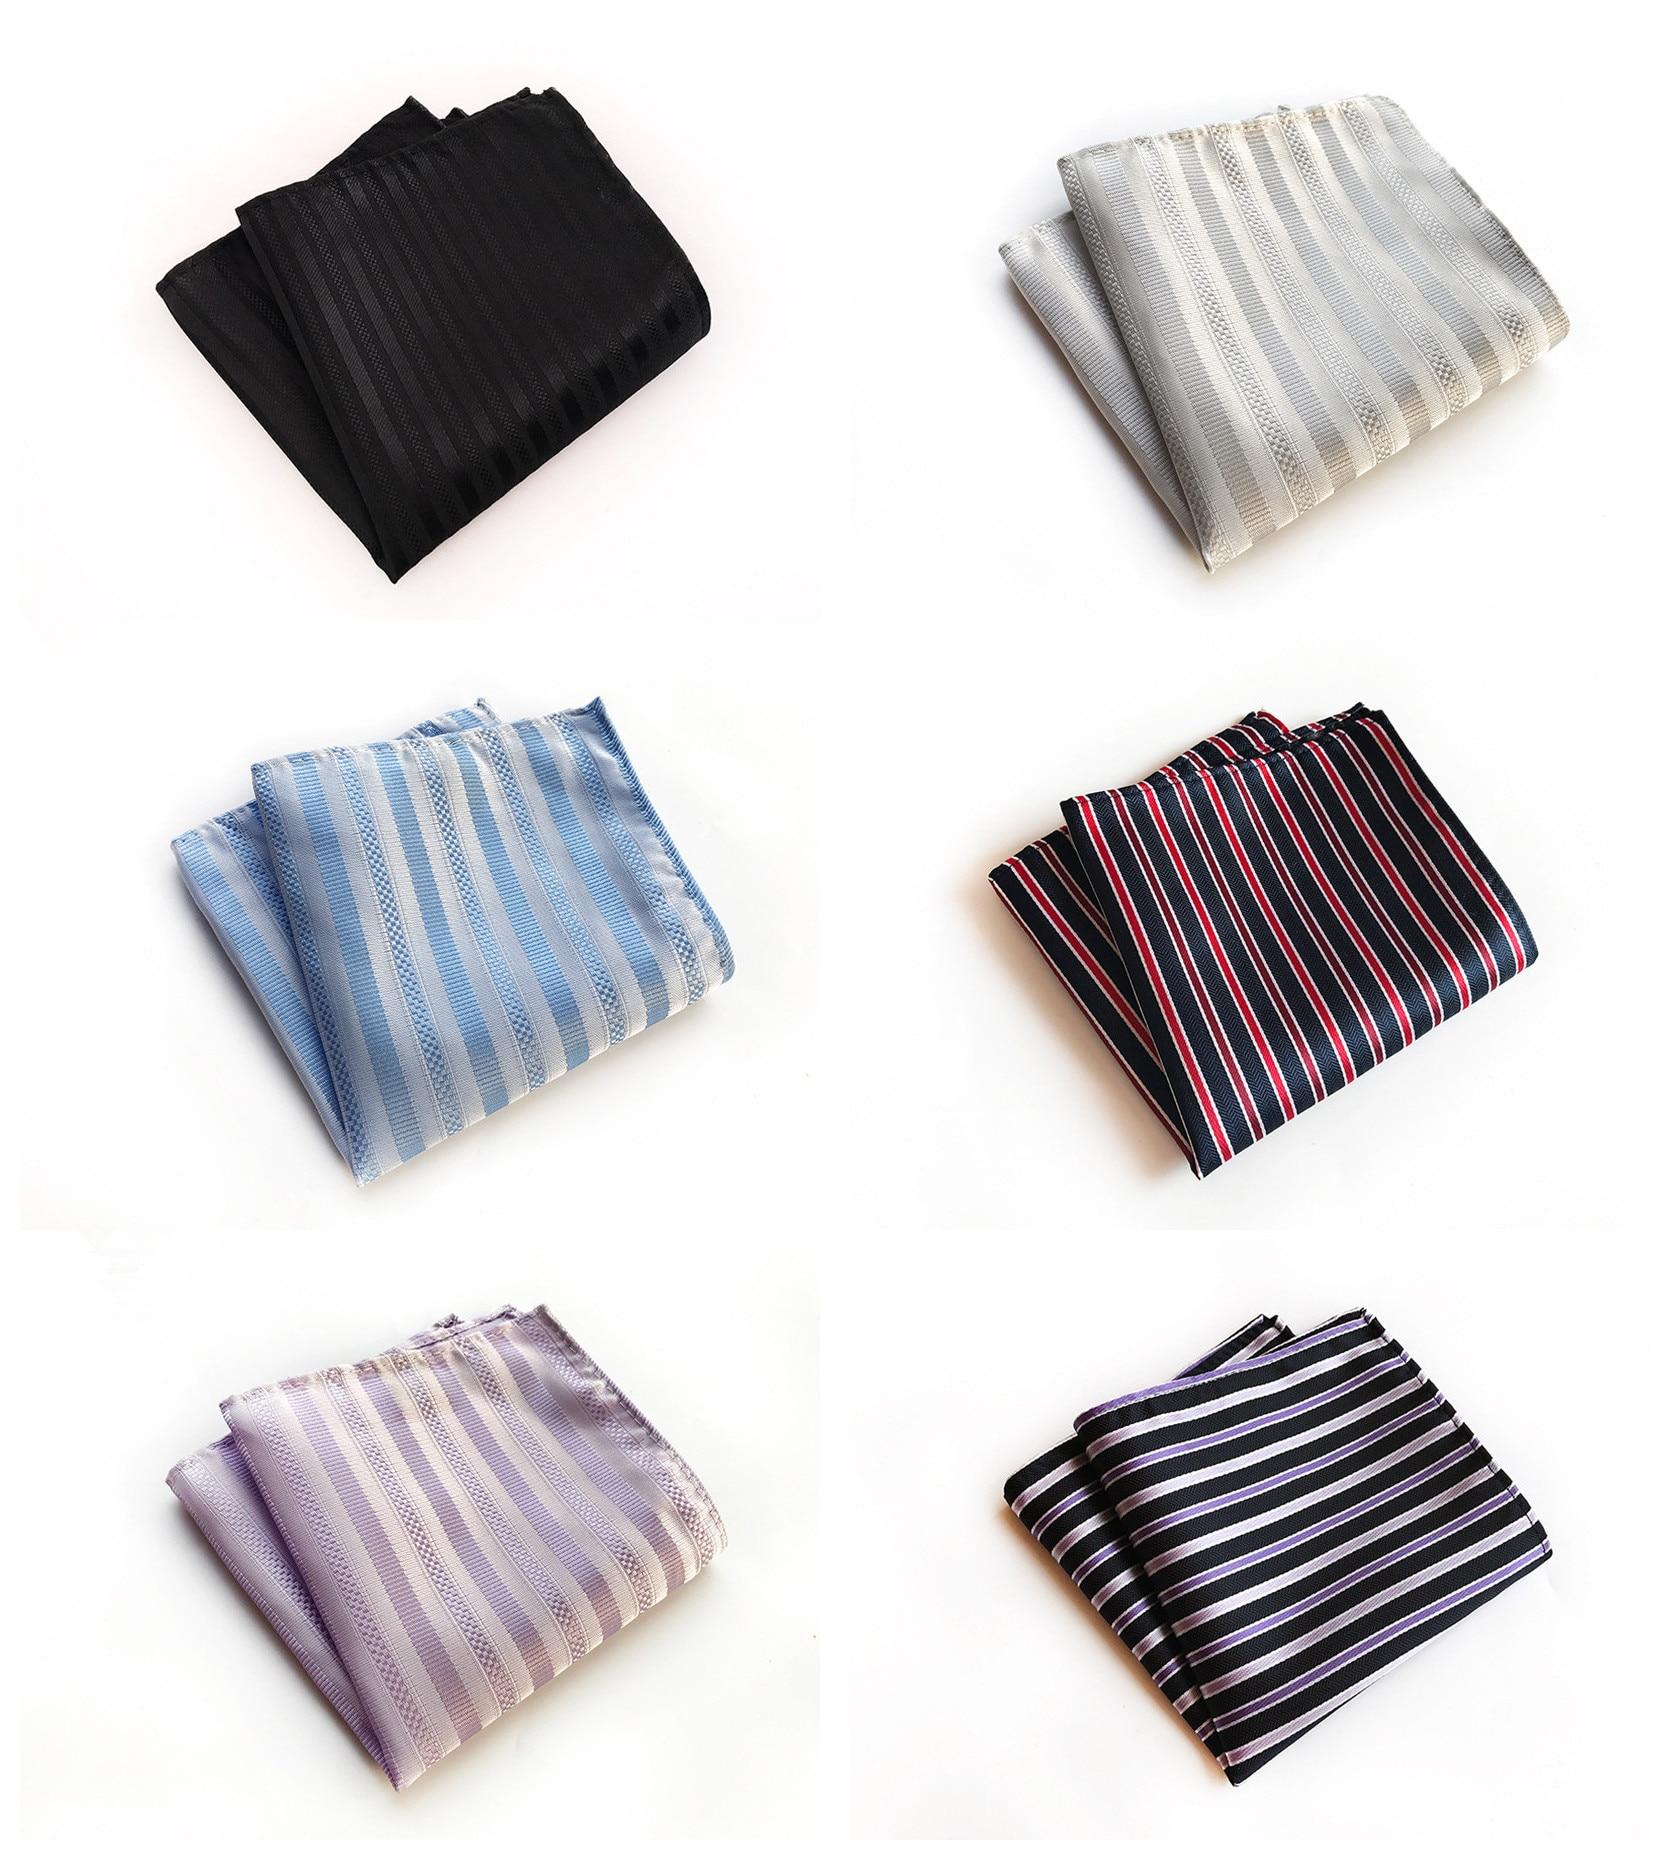 Fashion Explosions Monochrome Business Dress High Quality Pocket Towel Unique Design Retro 25x25cm Polyester Pocket Towel